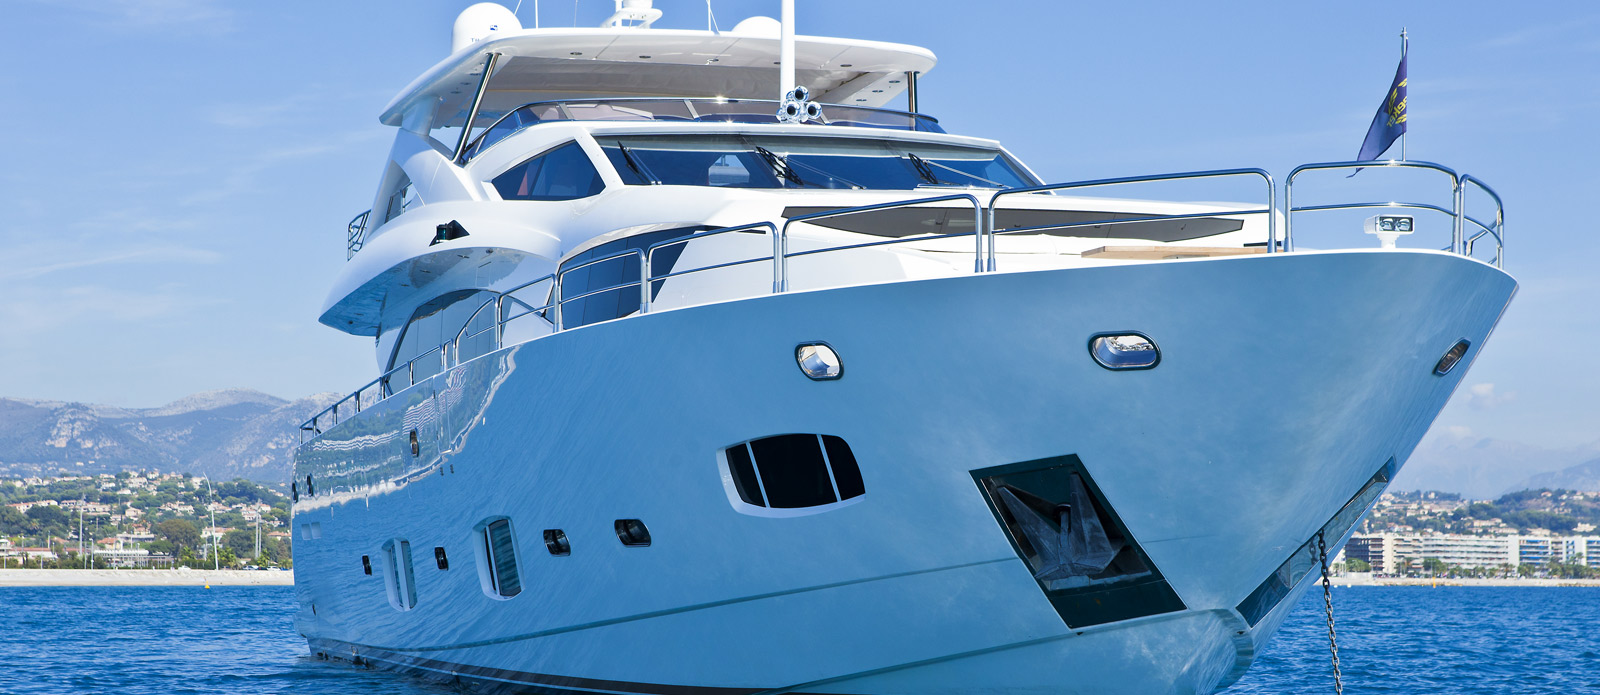 Sunseeker-30-Metre-Yacht-Tuppence-Bow-Shot